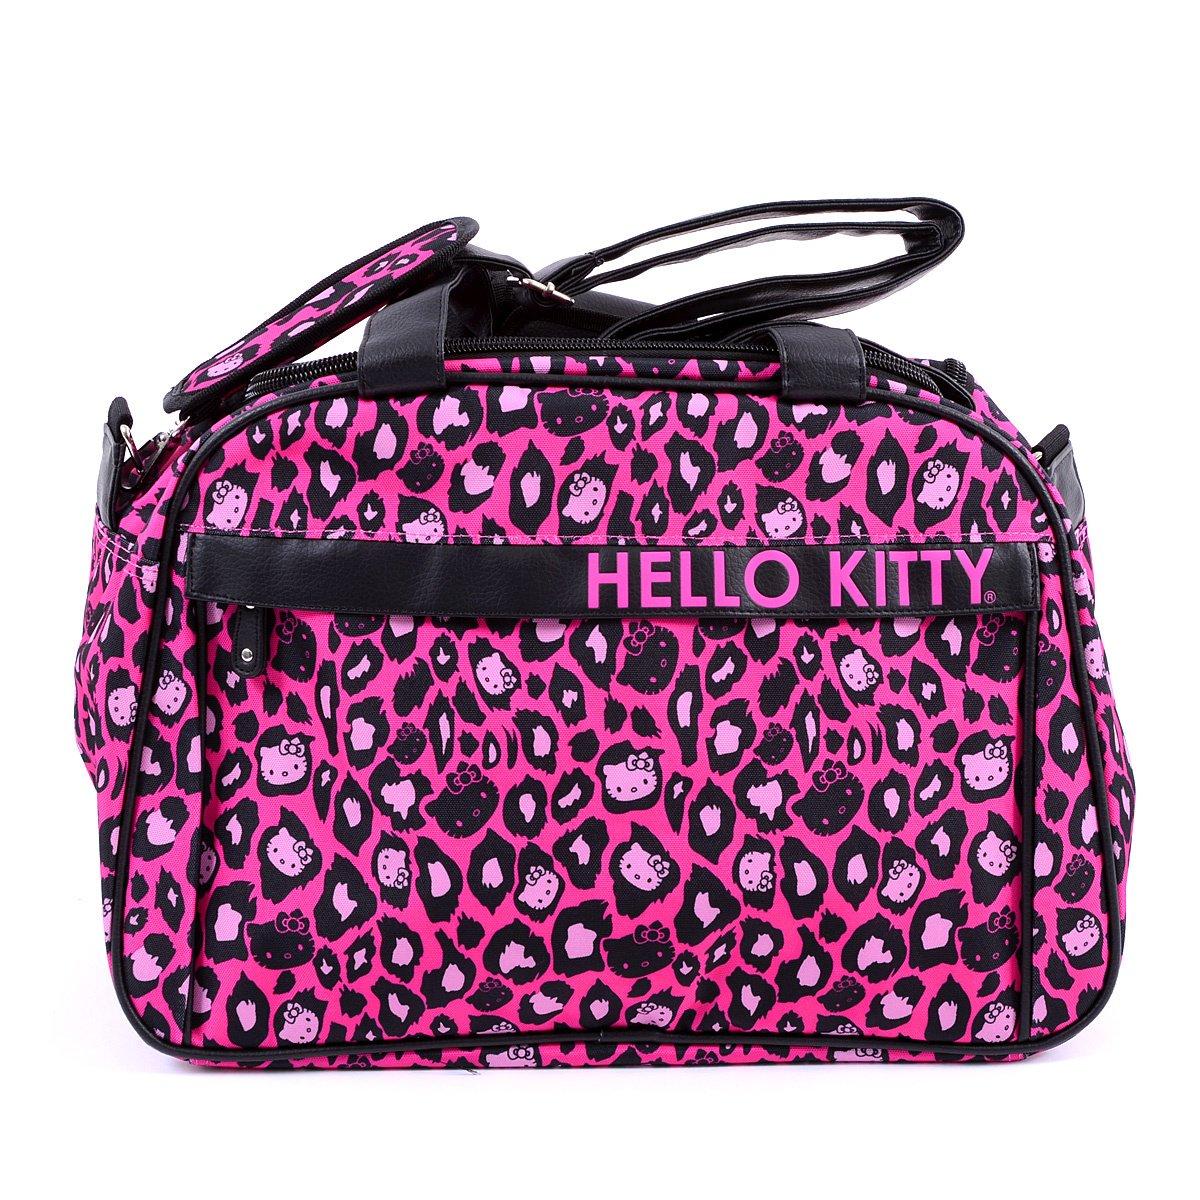 b0b0e6911c Hello Kitty Pink Leopard Print Duffle Bag 6. Next. US 74.99